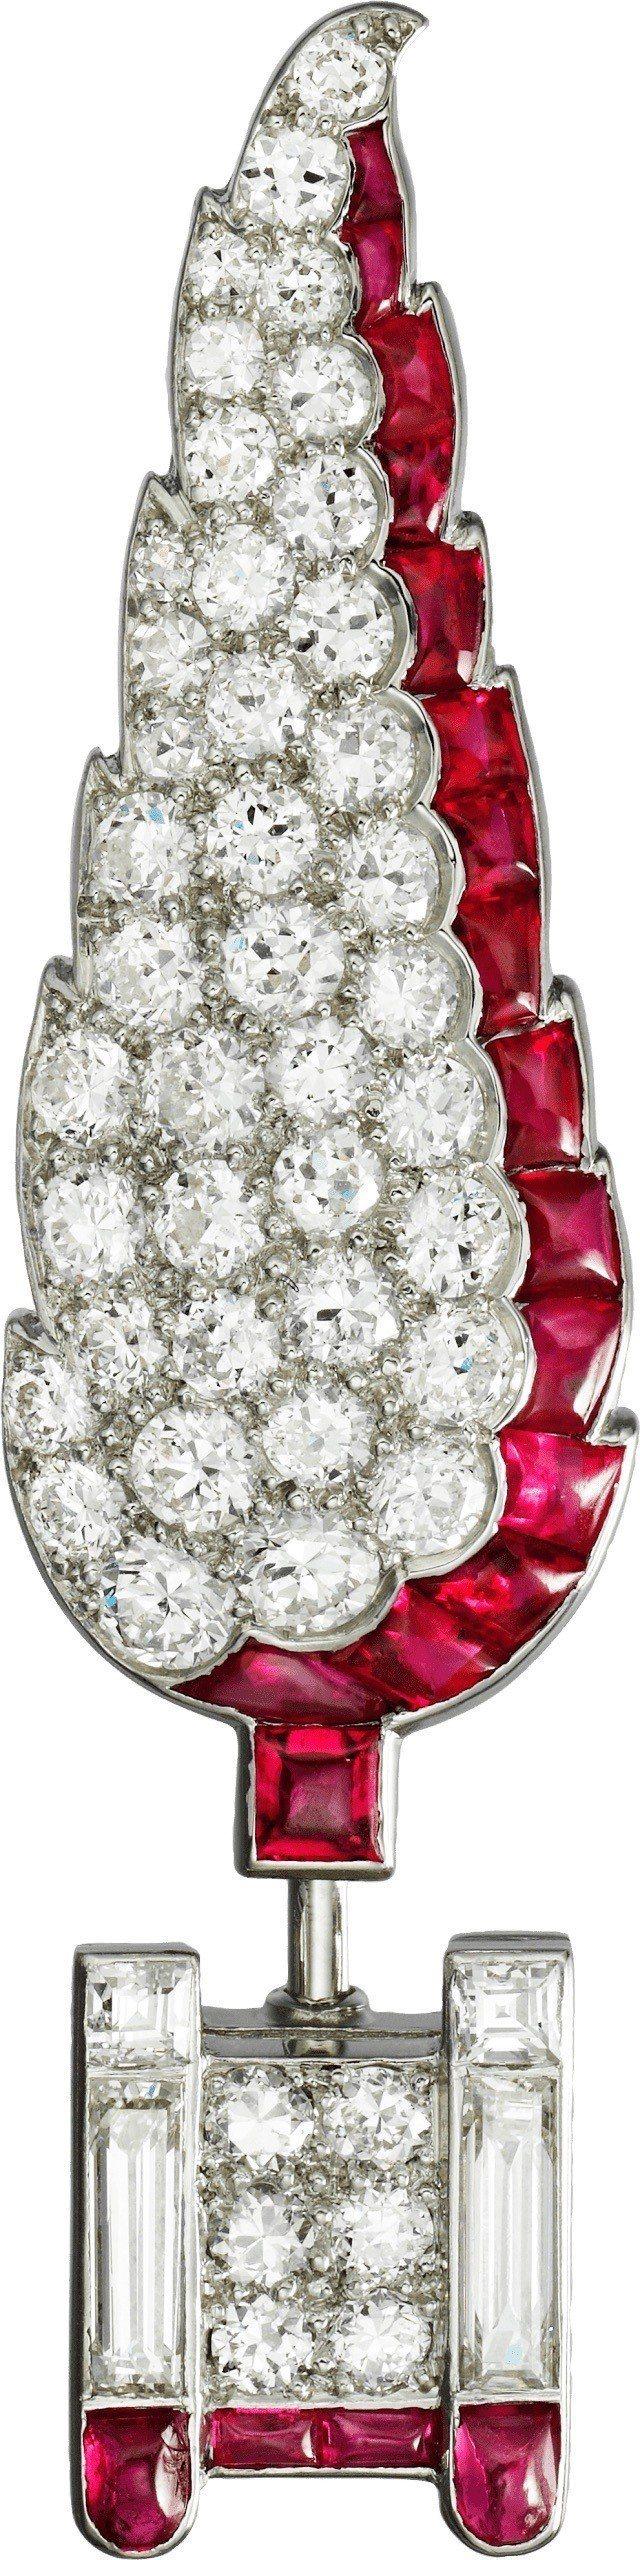 Cartier骨董系列胸針,鉑金鑲嵌紅寶石與鑽石,價格店洽。圖/卡地亞提供